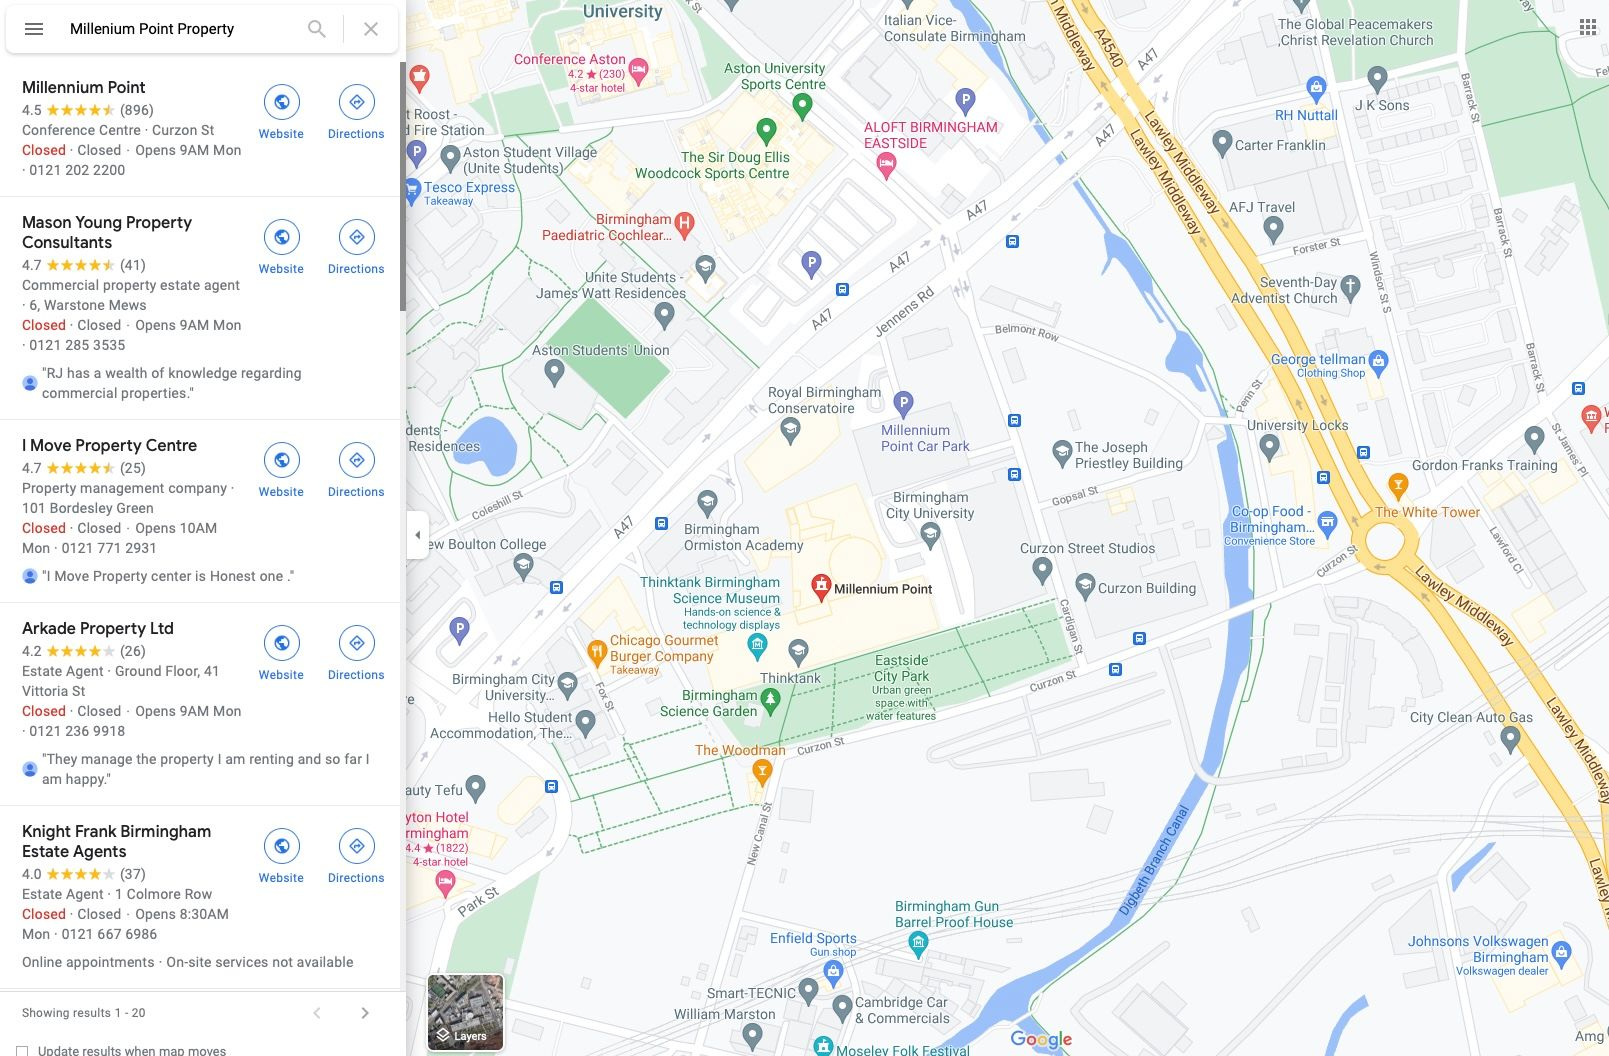 birmingham city university (web only - google maps)